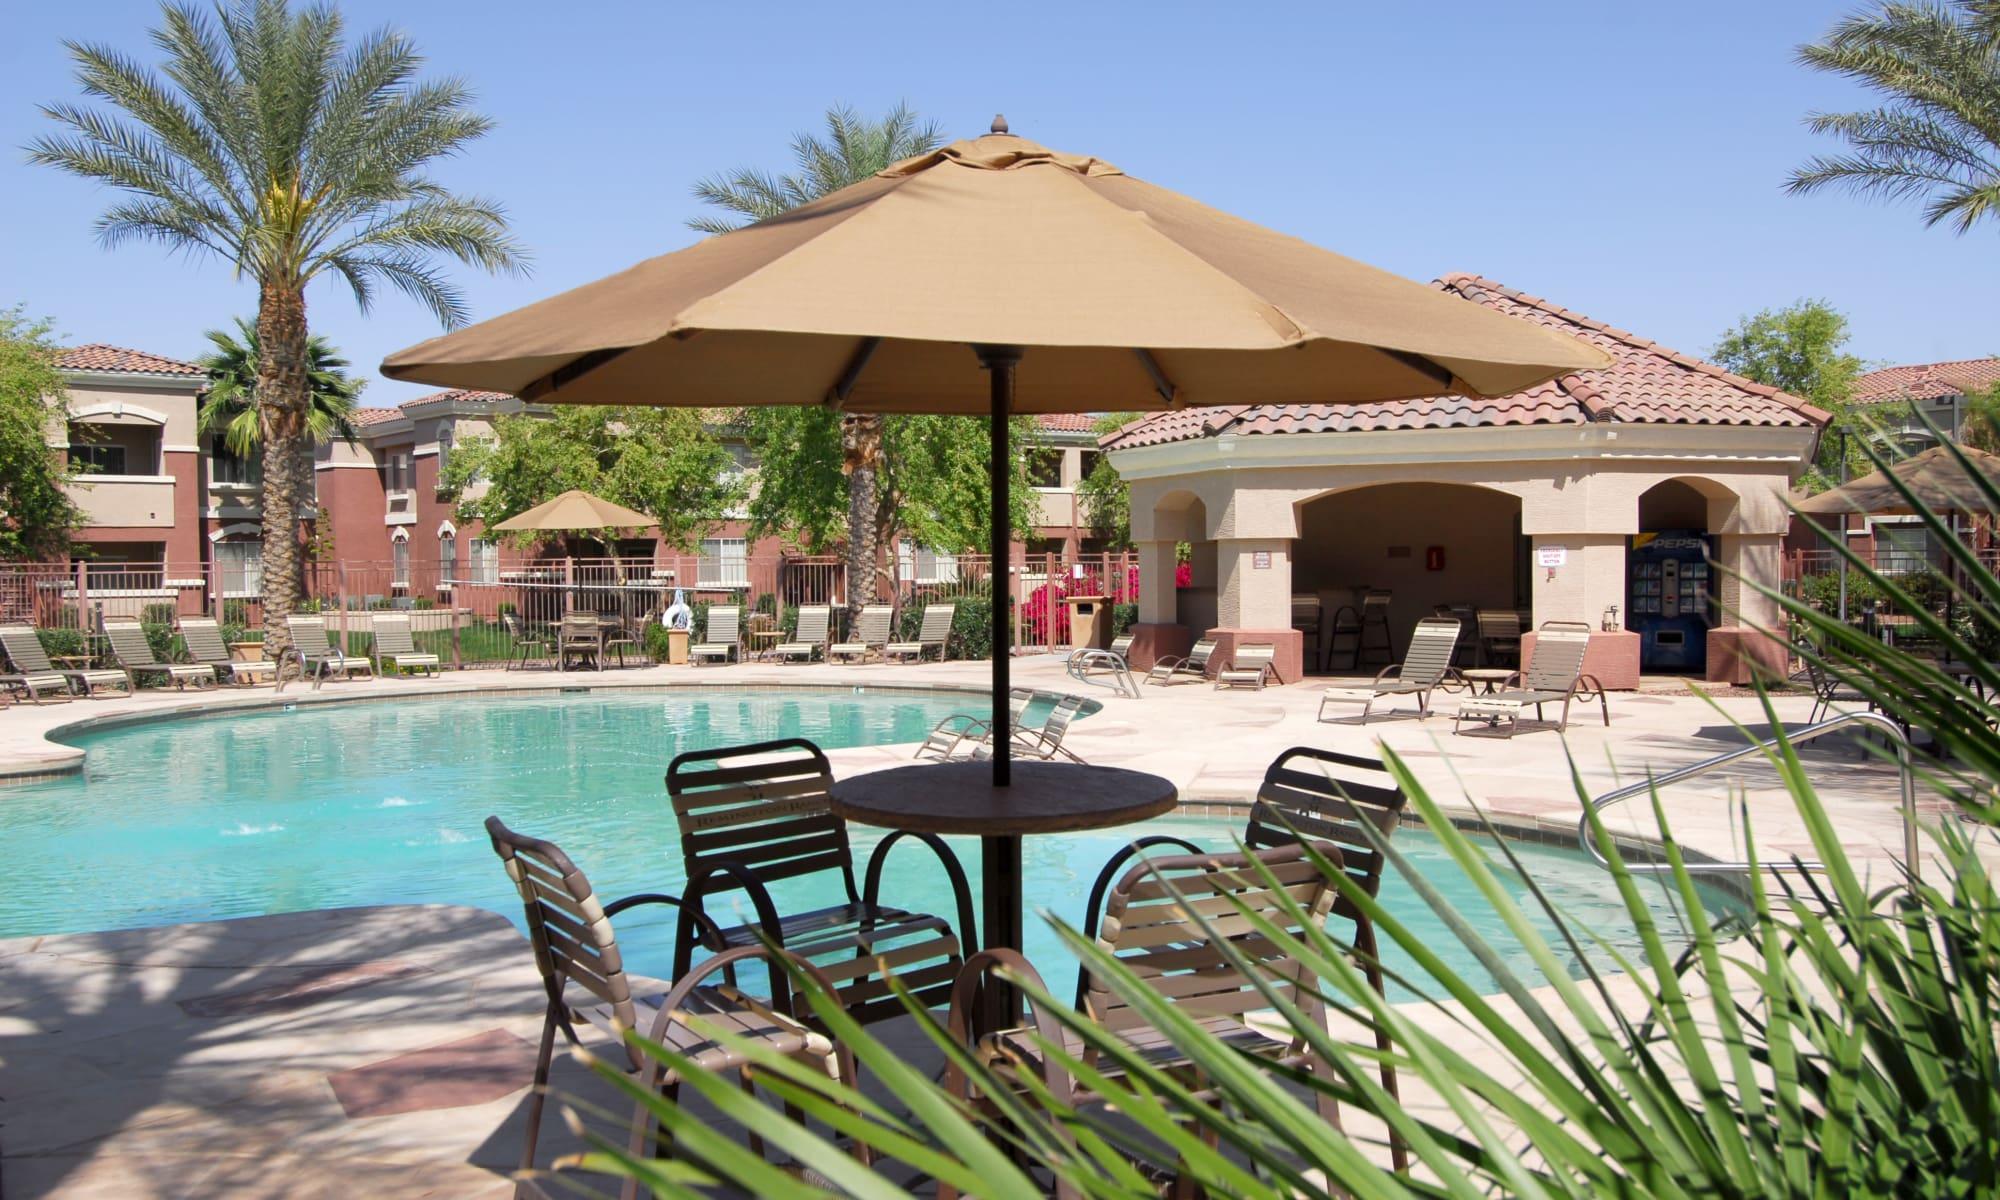 Apartments in Litchfield Park, Arizona at Remington Ranch